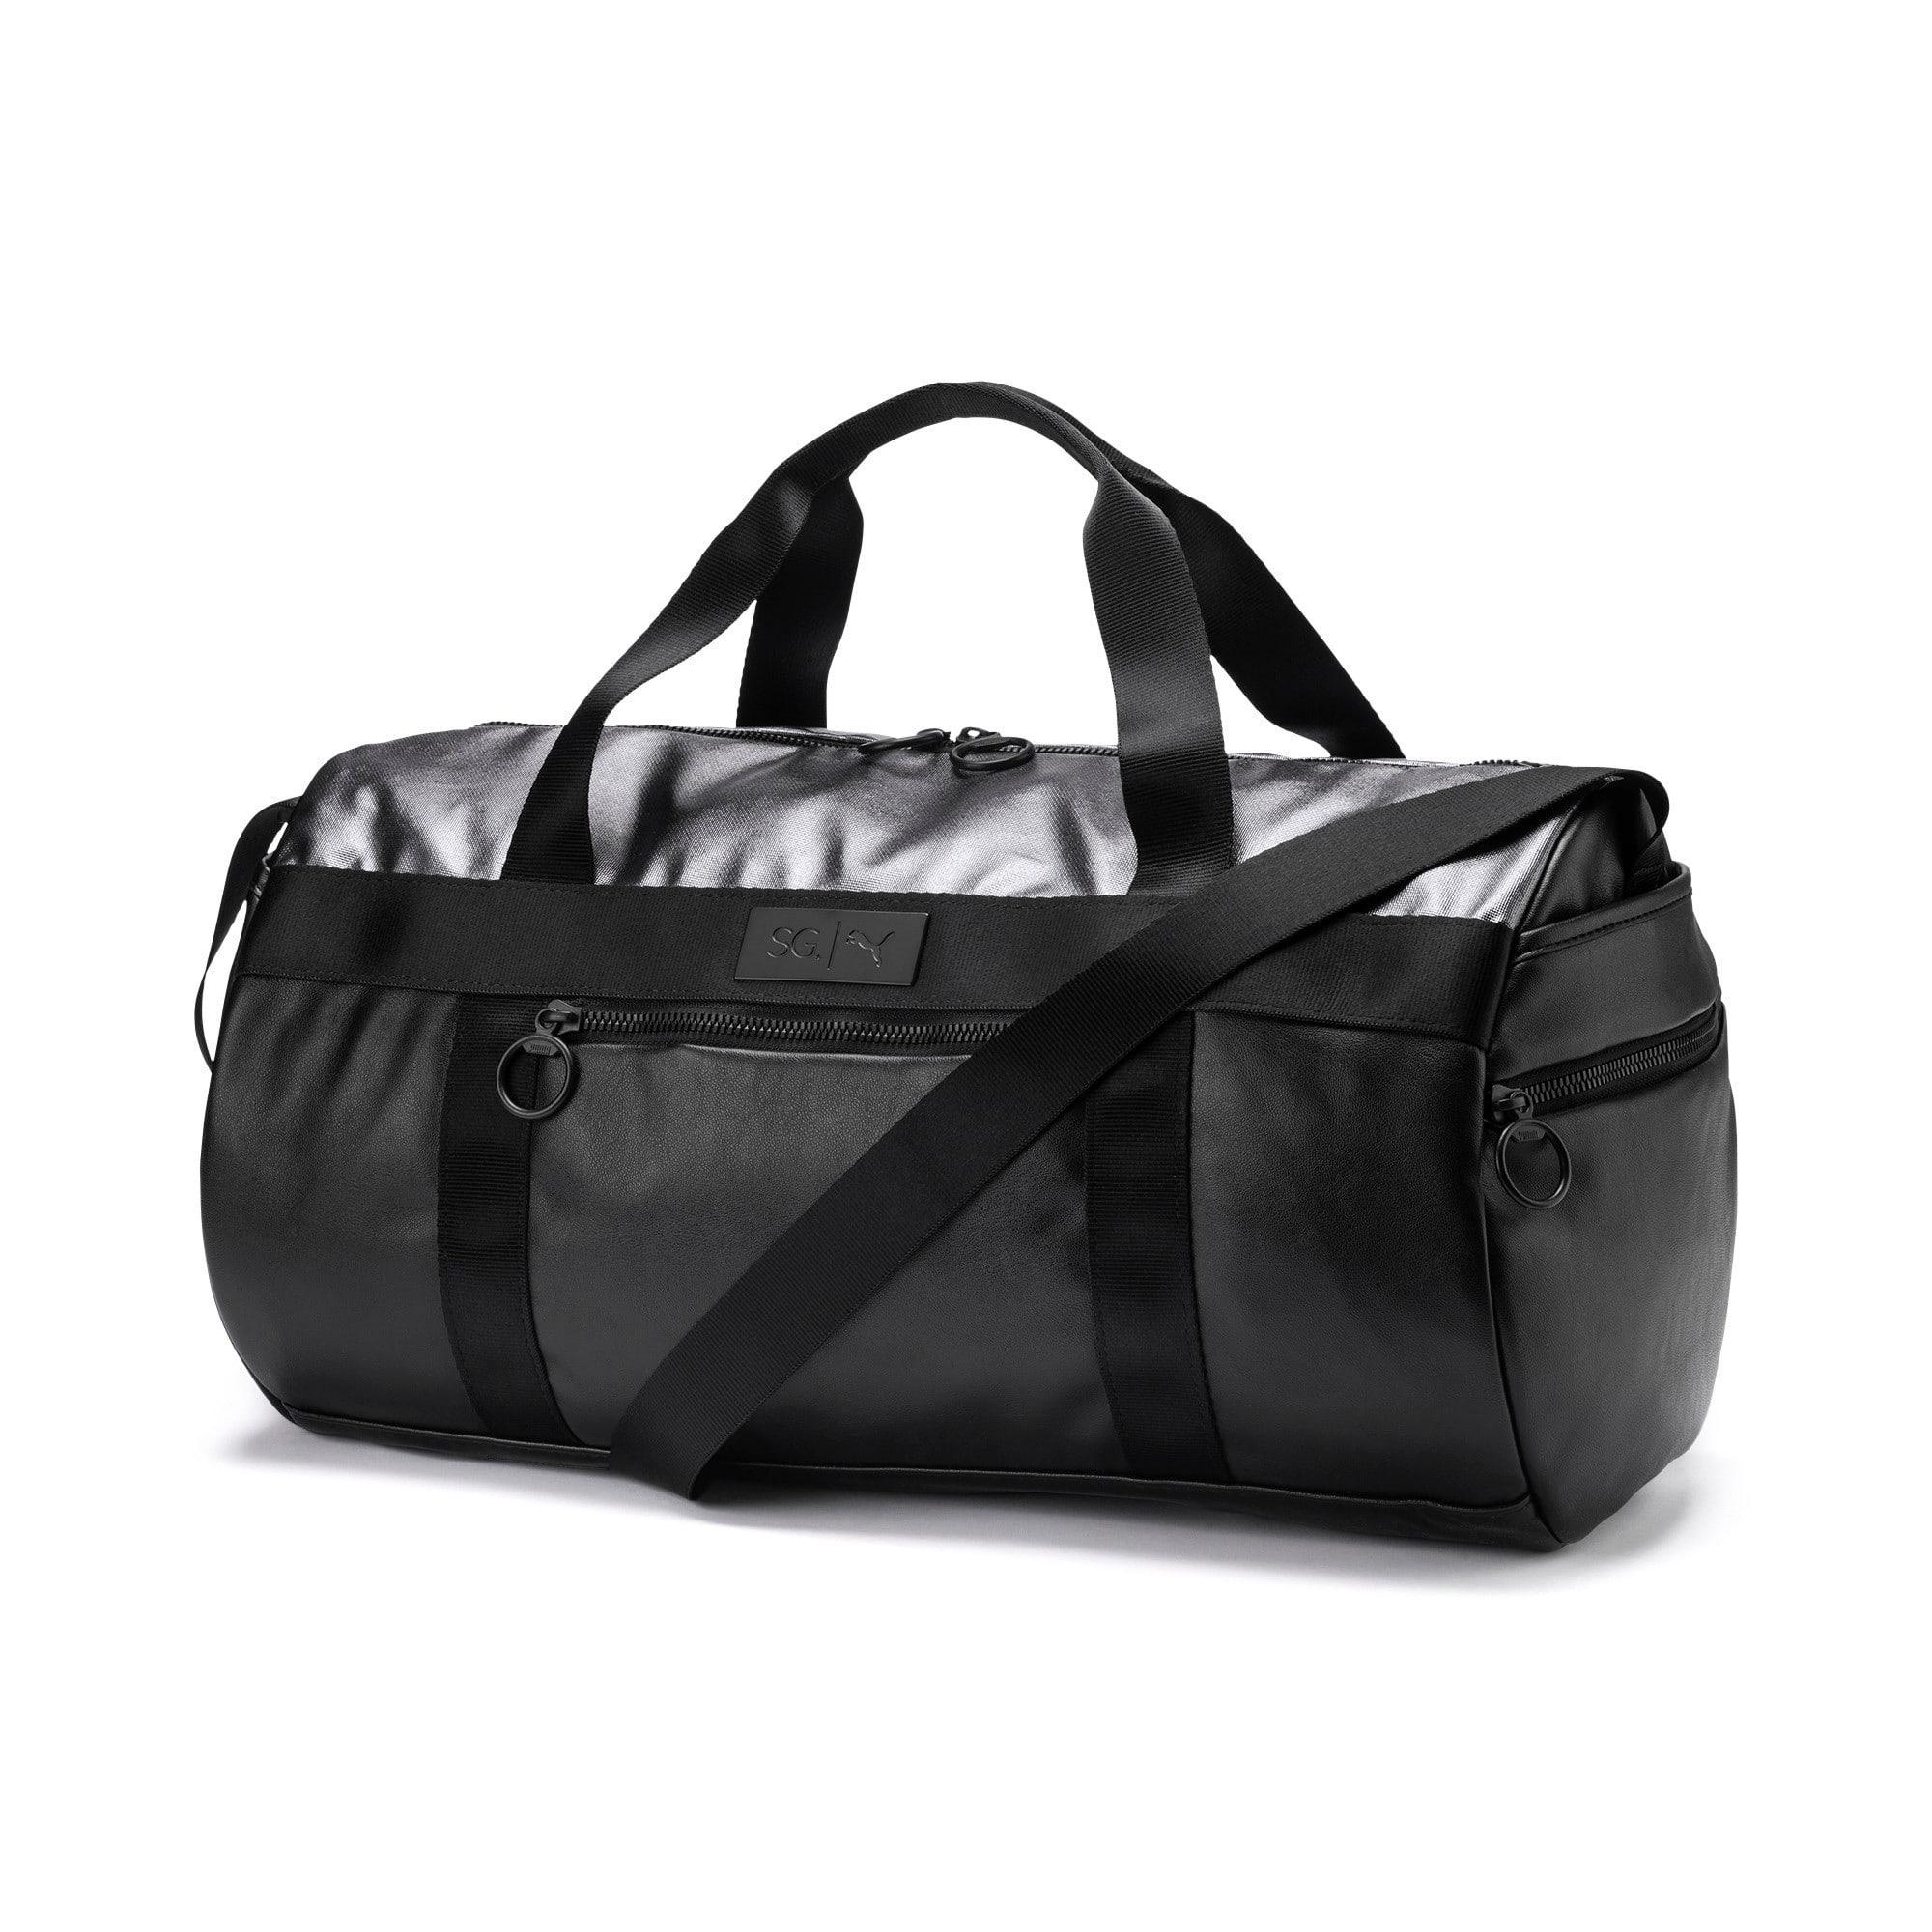 Thumbnail 1 of SG x PUMA Style Barrel Bag, Puma Black, medium